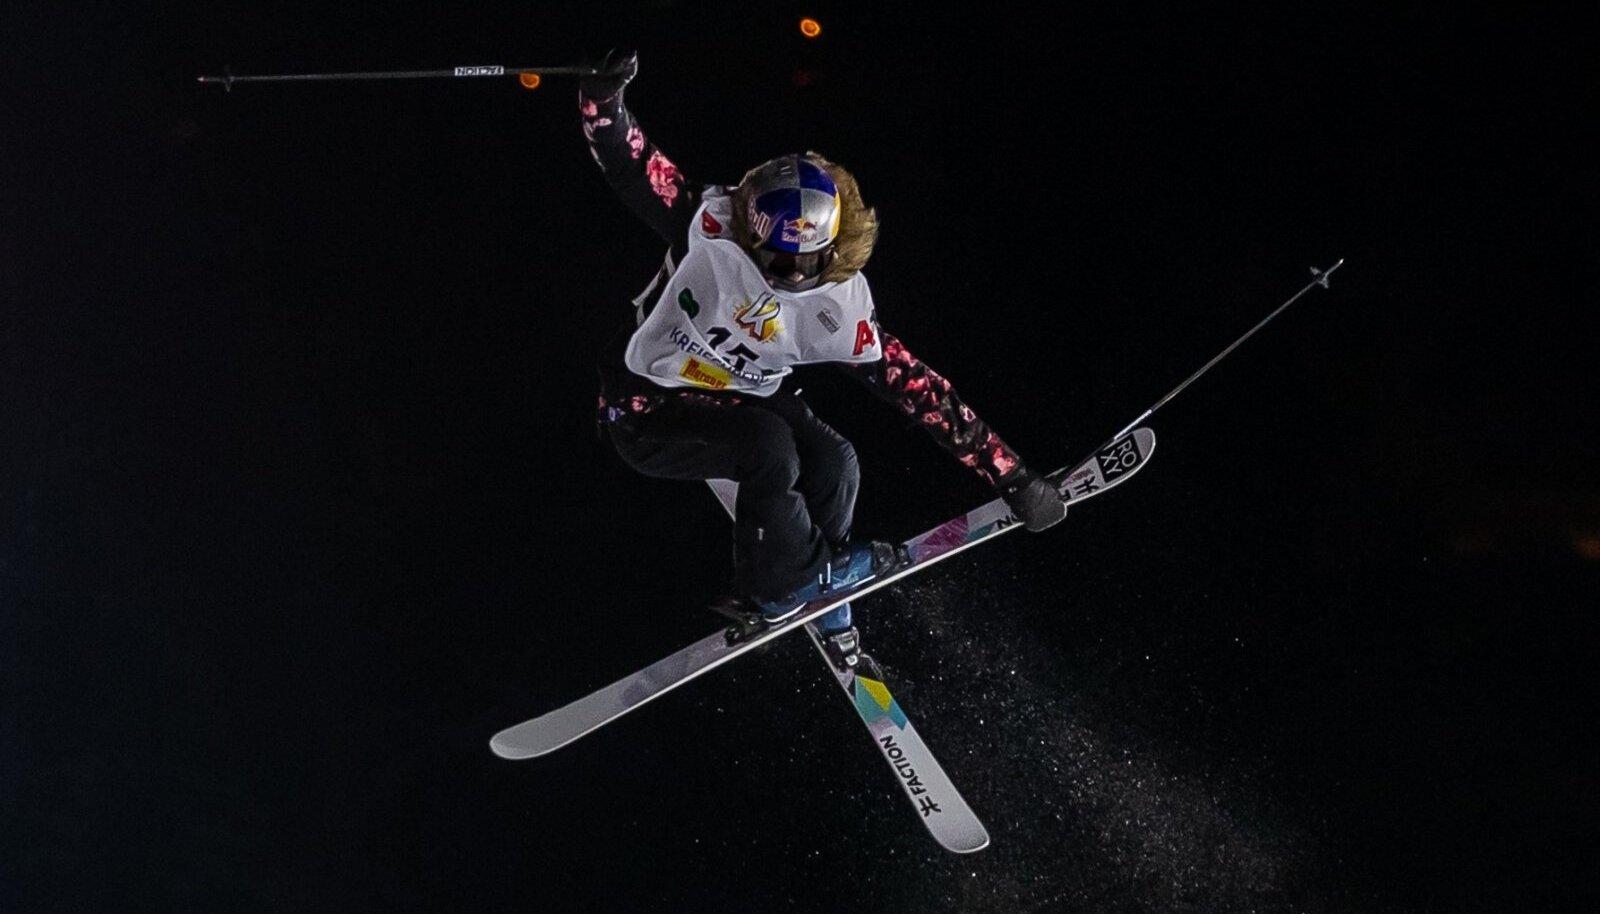 Kelly Sildaru Kreischbergi MK-etapil.